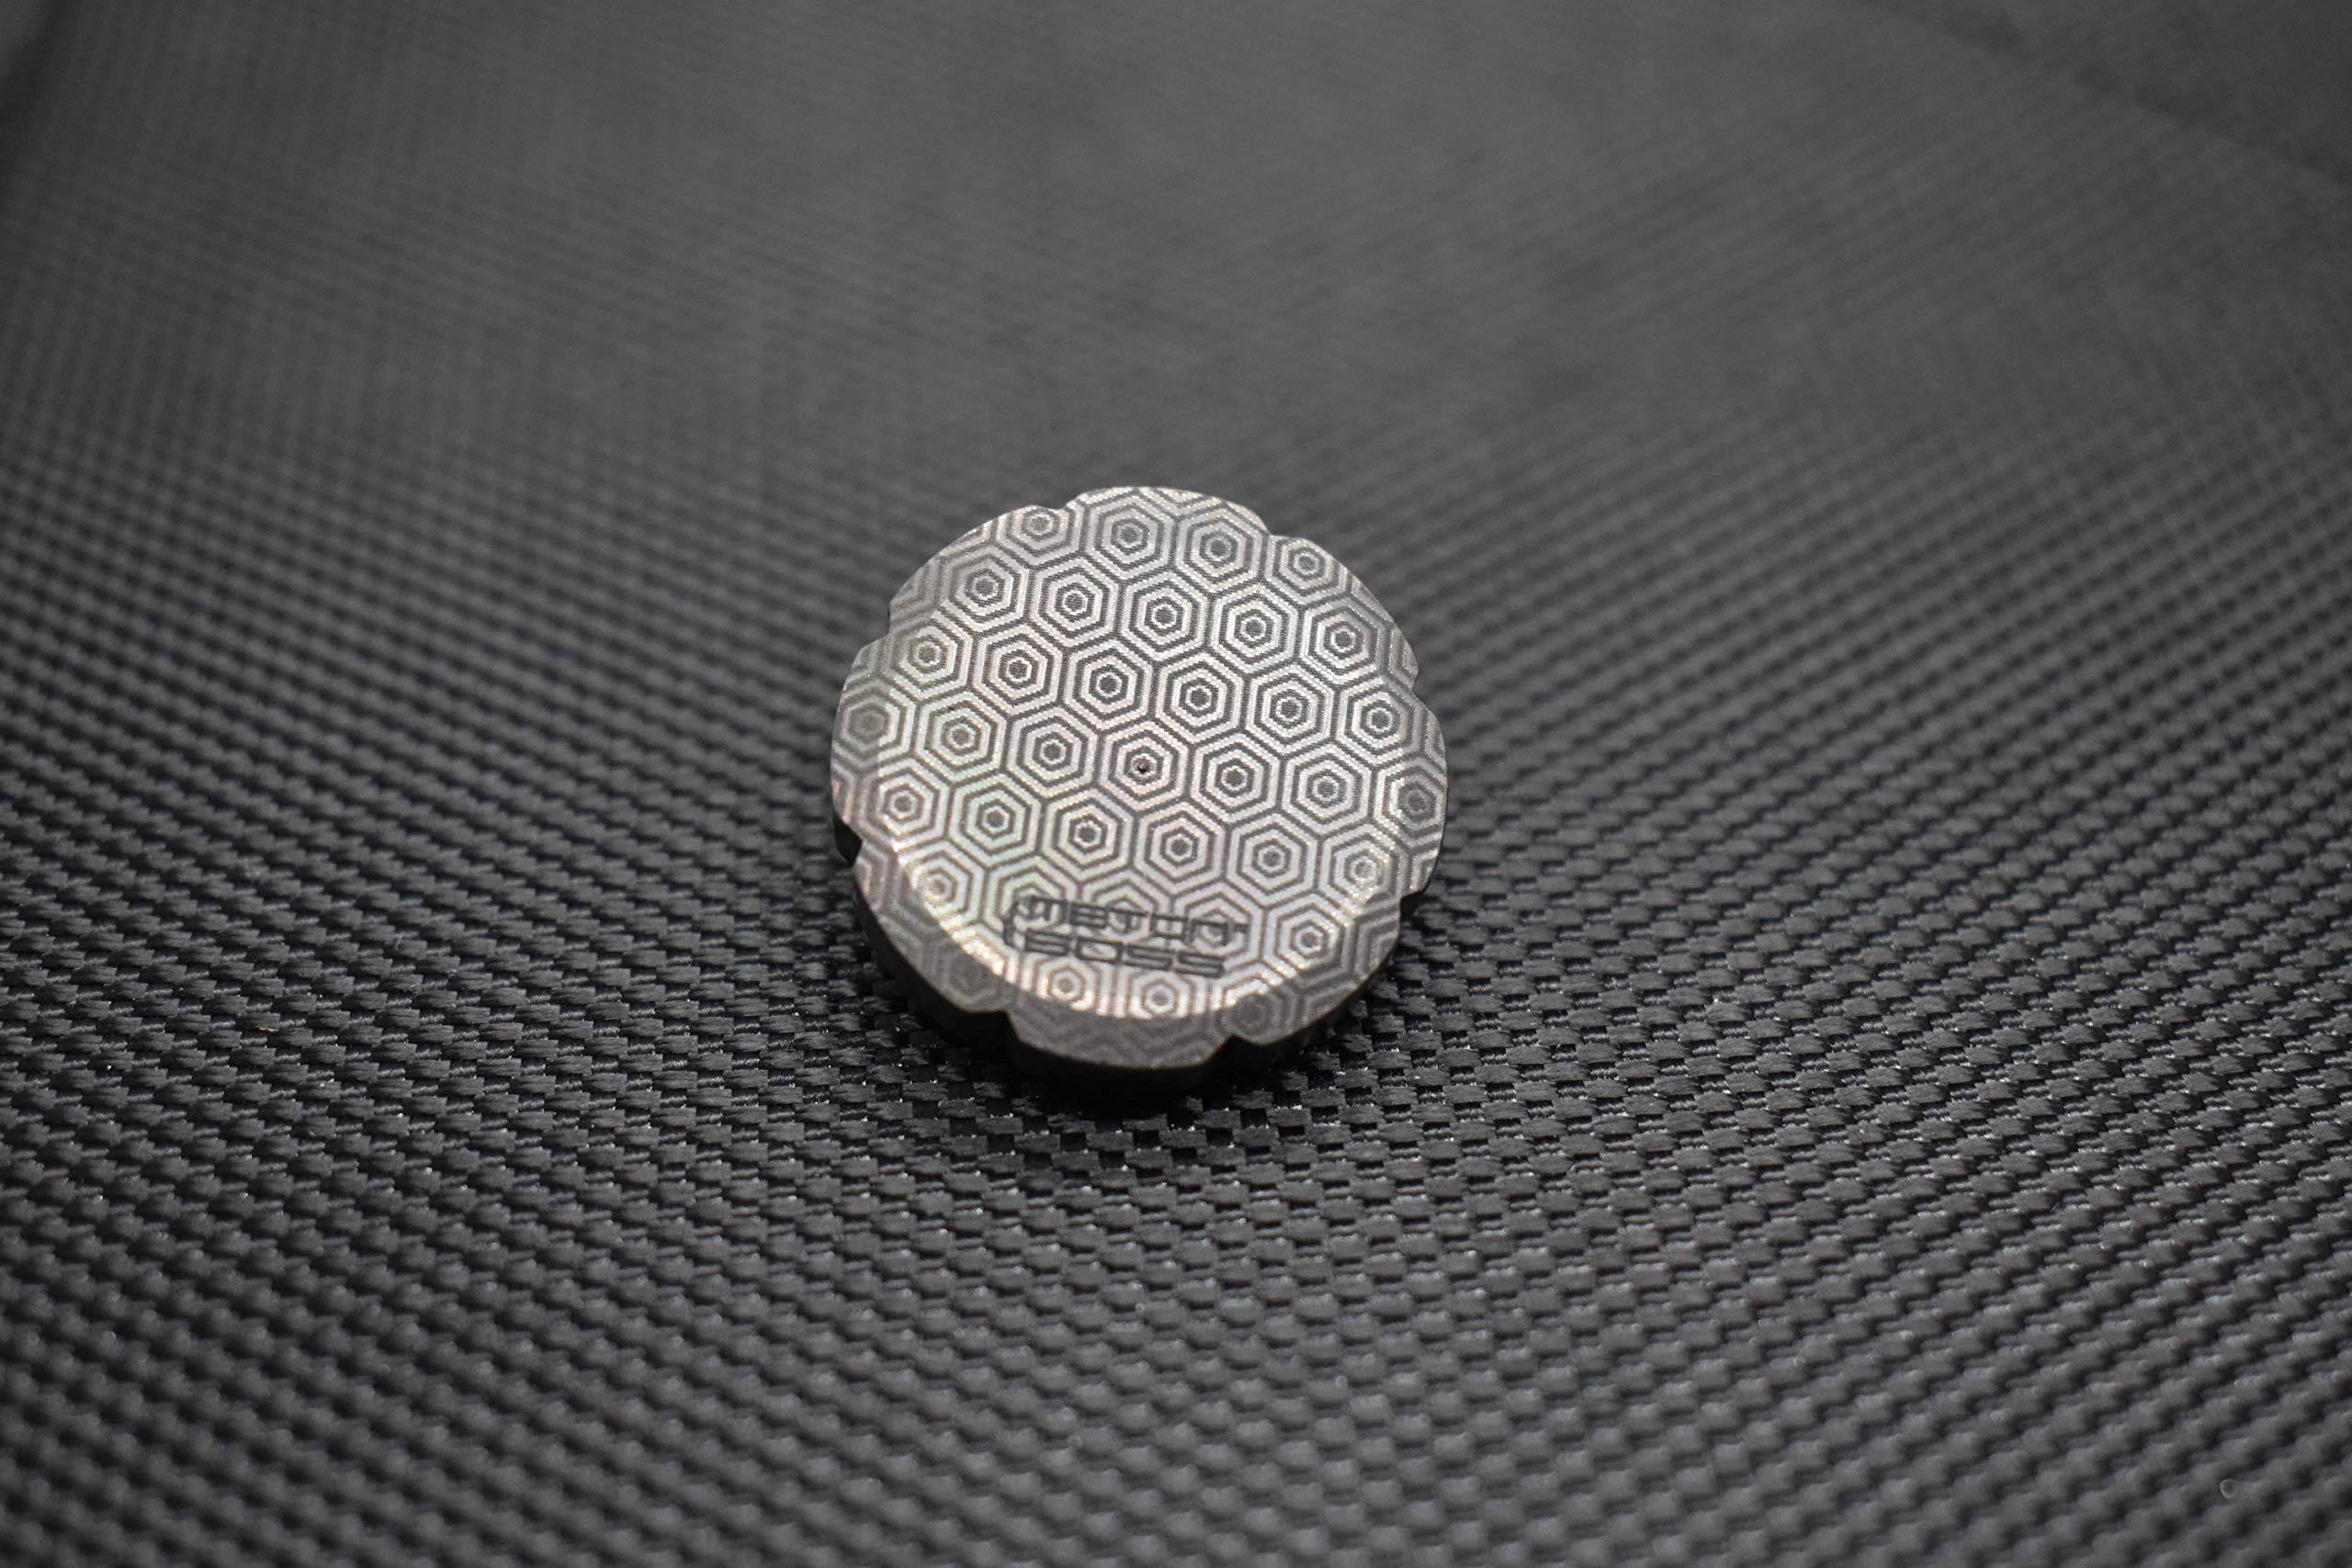 MetonBoss Worry Coin Black Zirconium & Ruby Bearing   Everyday Carry Gear   Precision-Made and Desktop Display by MetonBoss (Image #6)